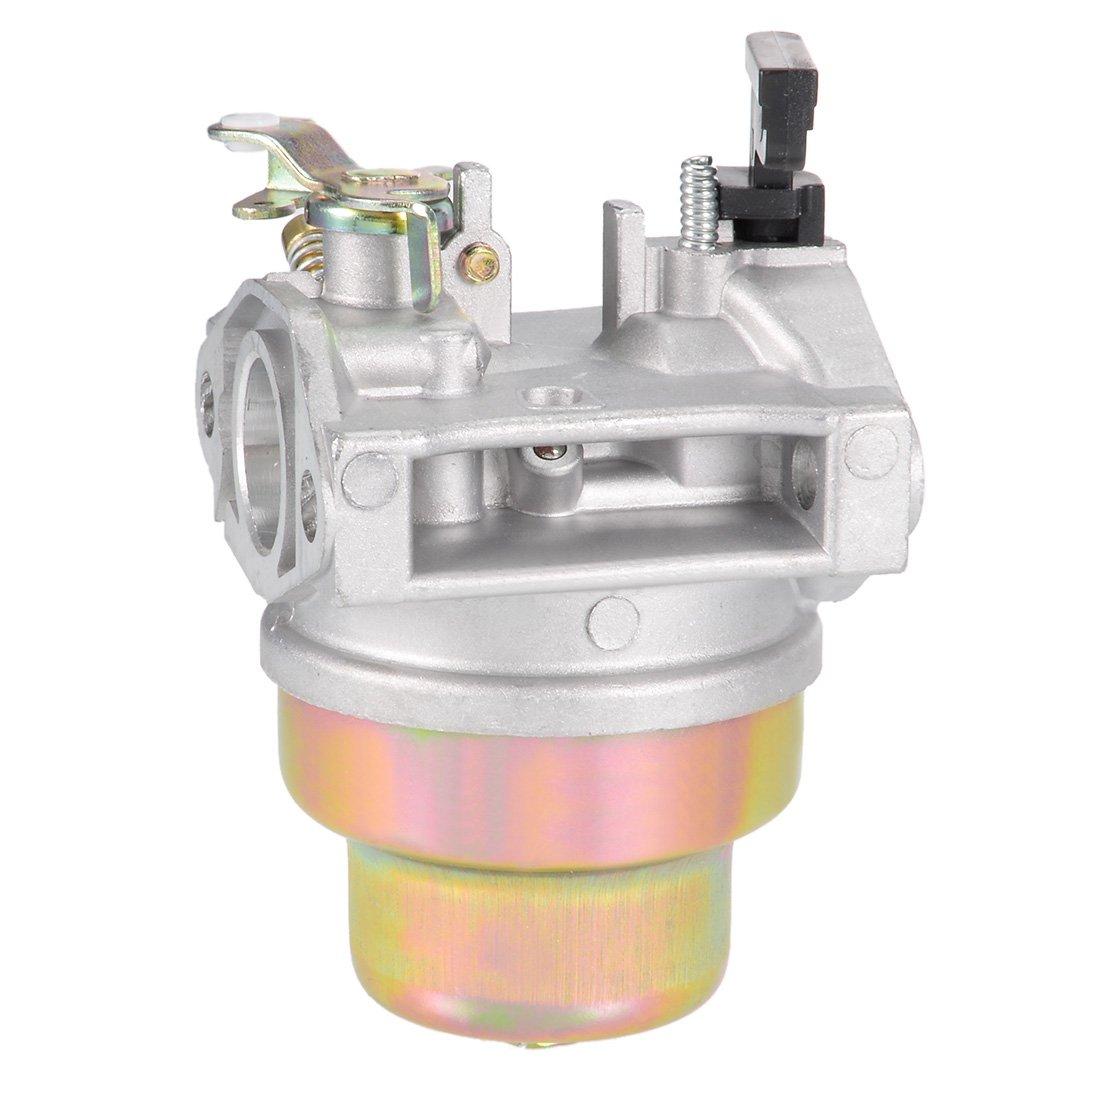 G150 Fuel Filter Wiring Diagram Library Honda Gx340 Gulfstream Interior Amazon Com Uxcell New Carburetor Generator Carb For